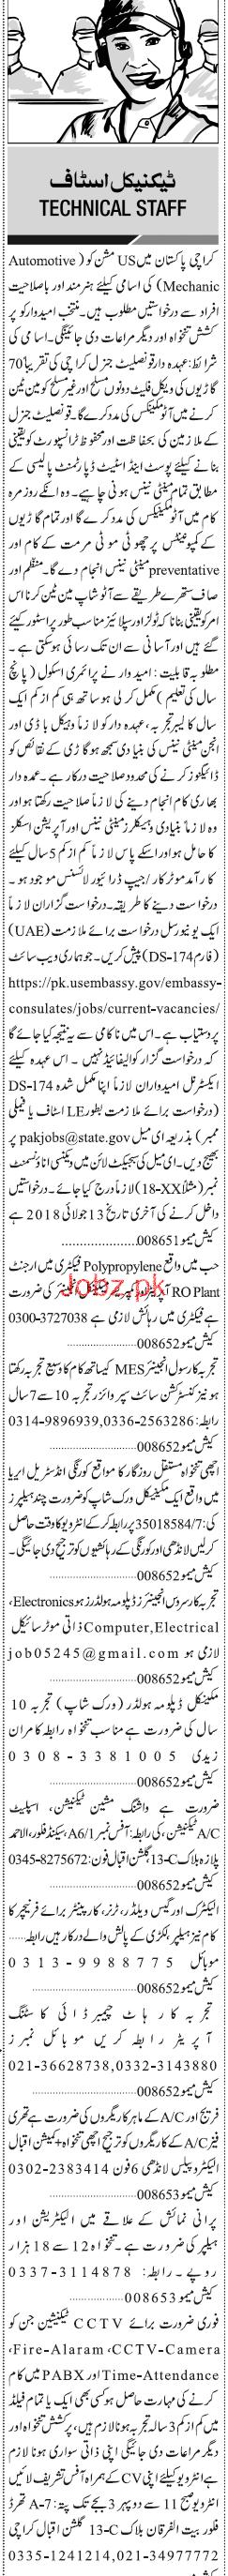 Plant Operators, Mechanical Engineers Wanted